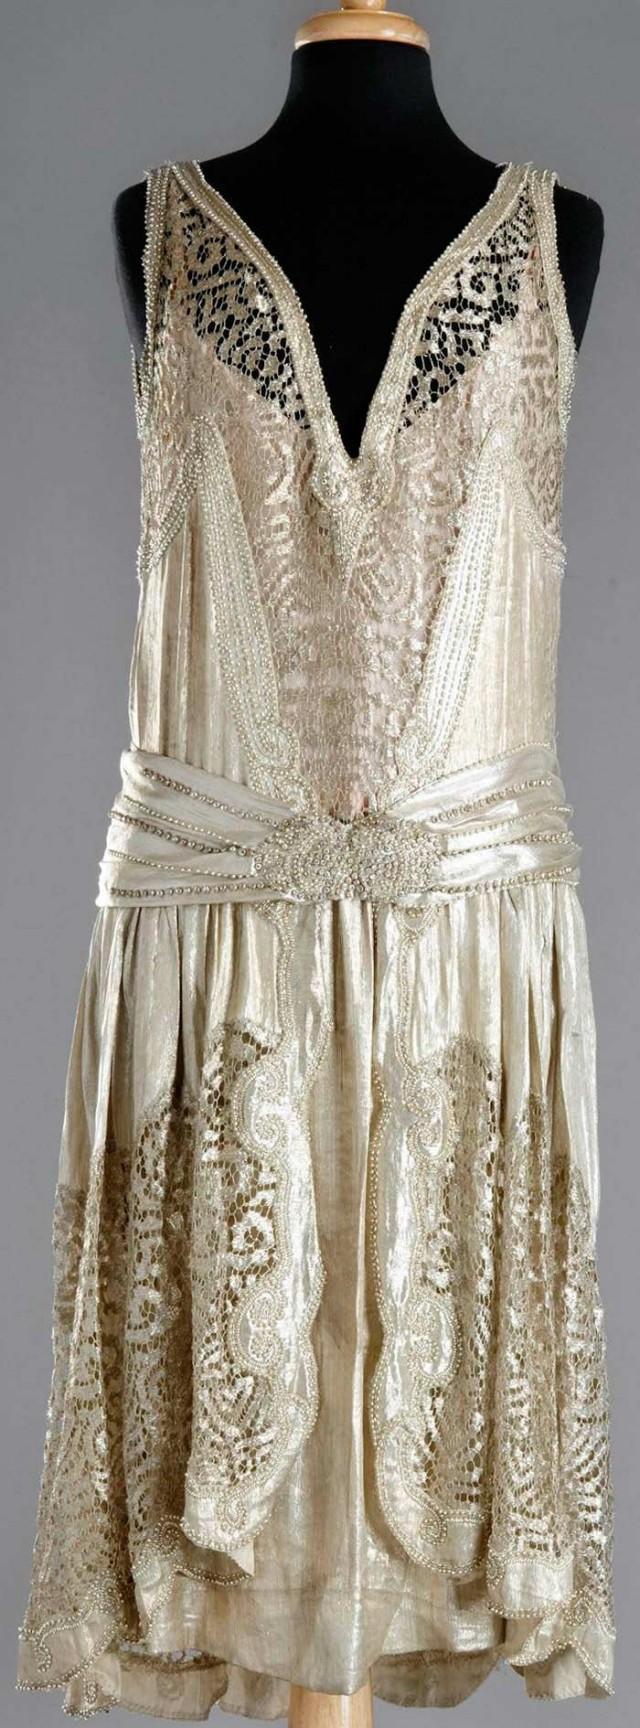 grand mariage gatsby charleston robe 1920 superbe d tail 2068461 weddbook. Black Bedroom Furniture Sets. Home Design Ideas